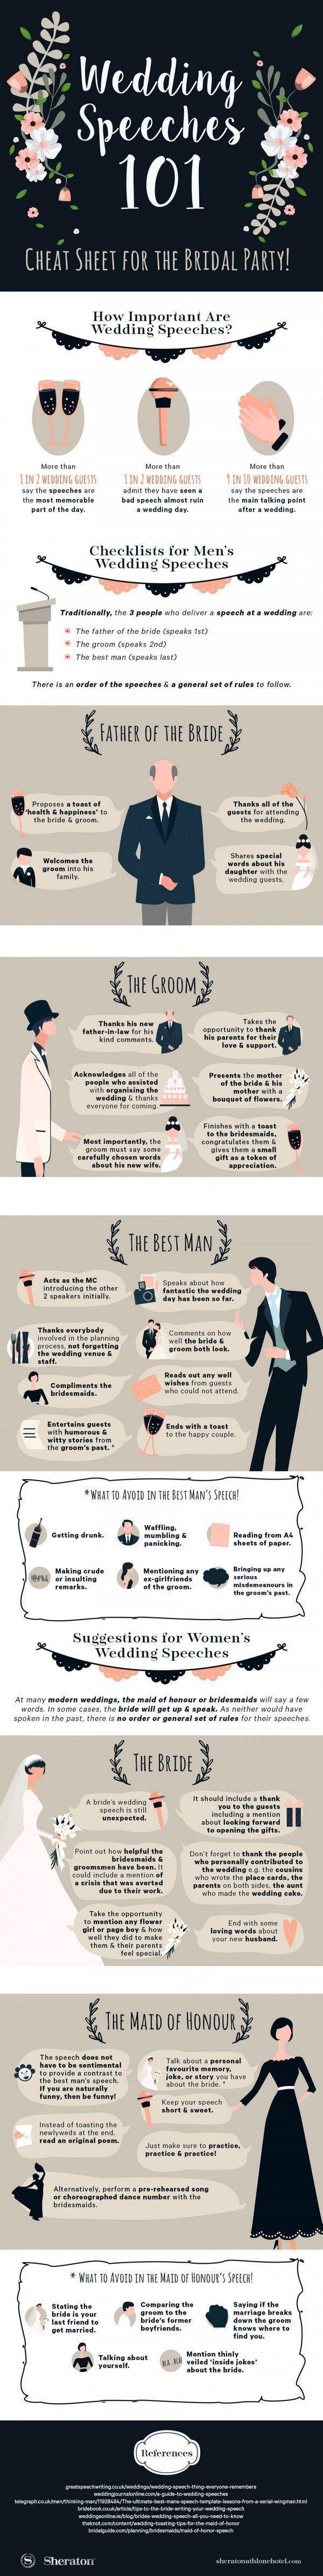 Wedding Speeches 101 Infographic Deerpearlflowers